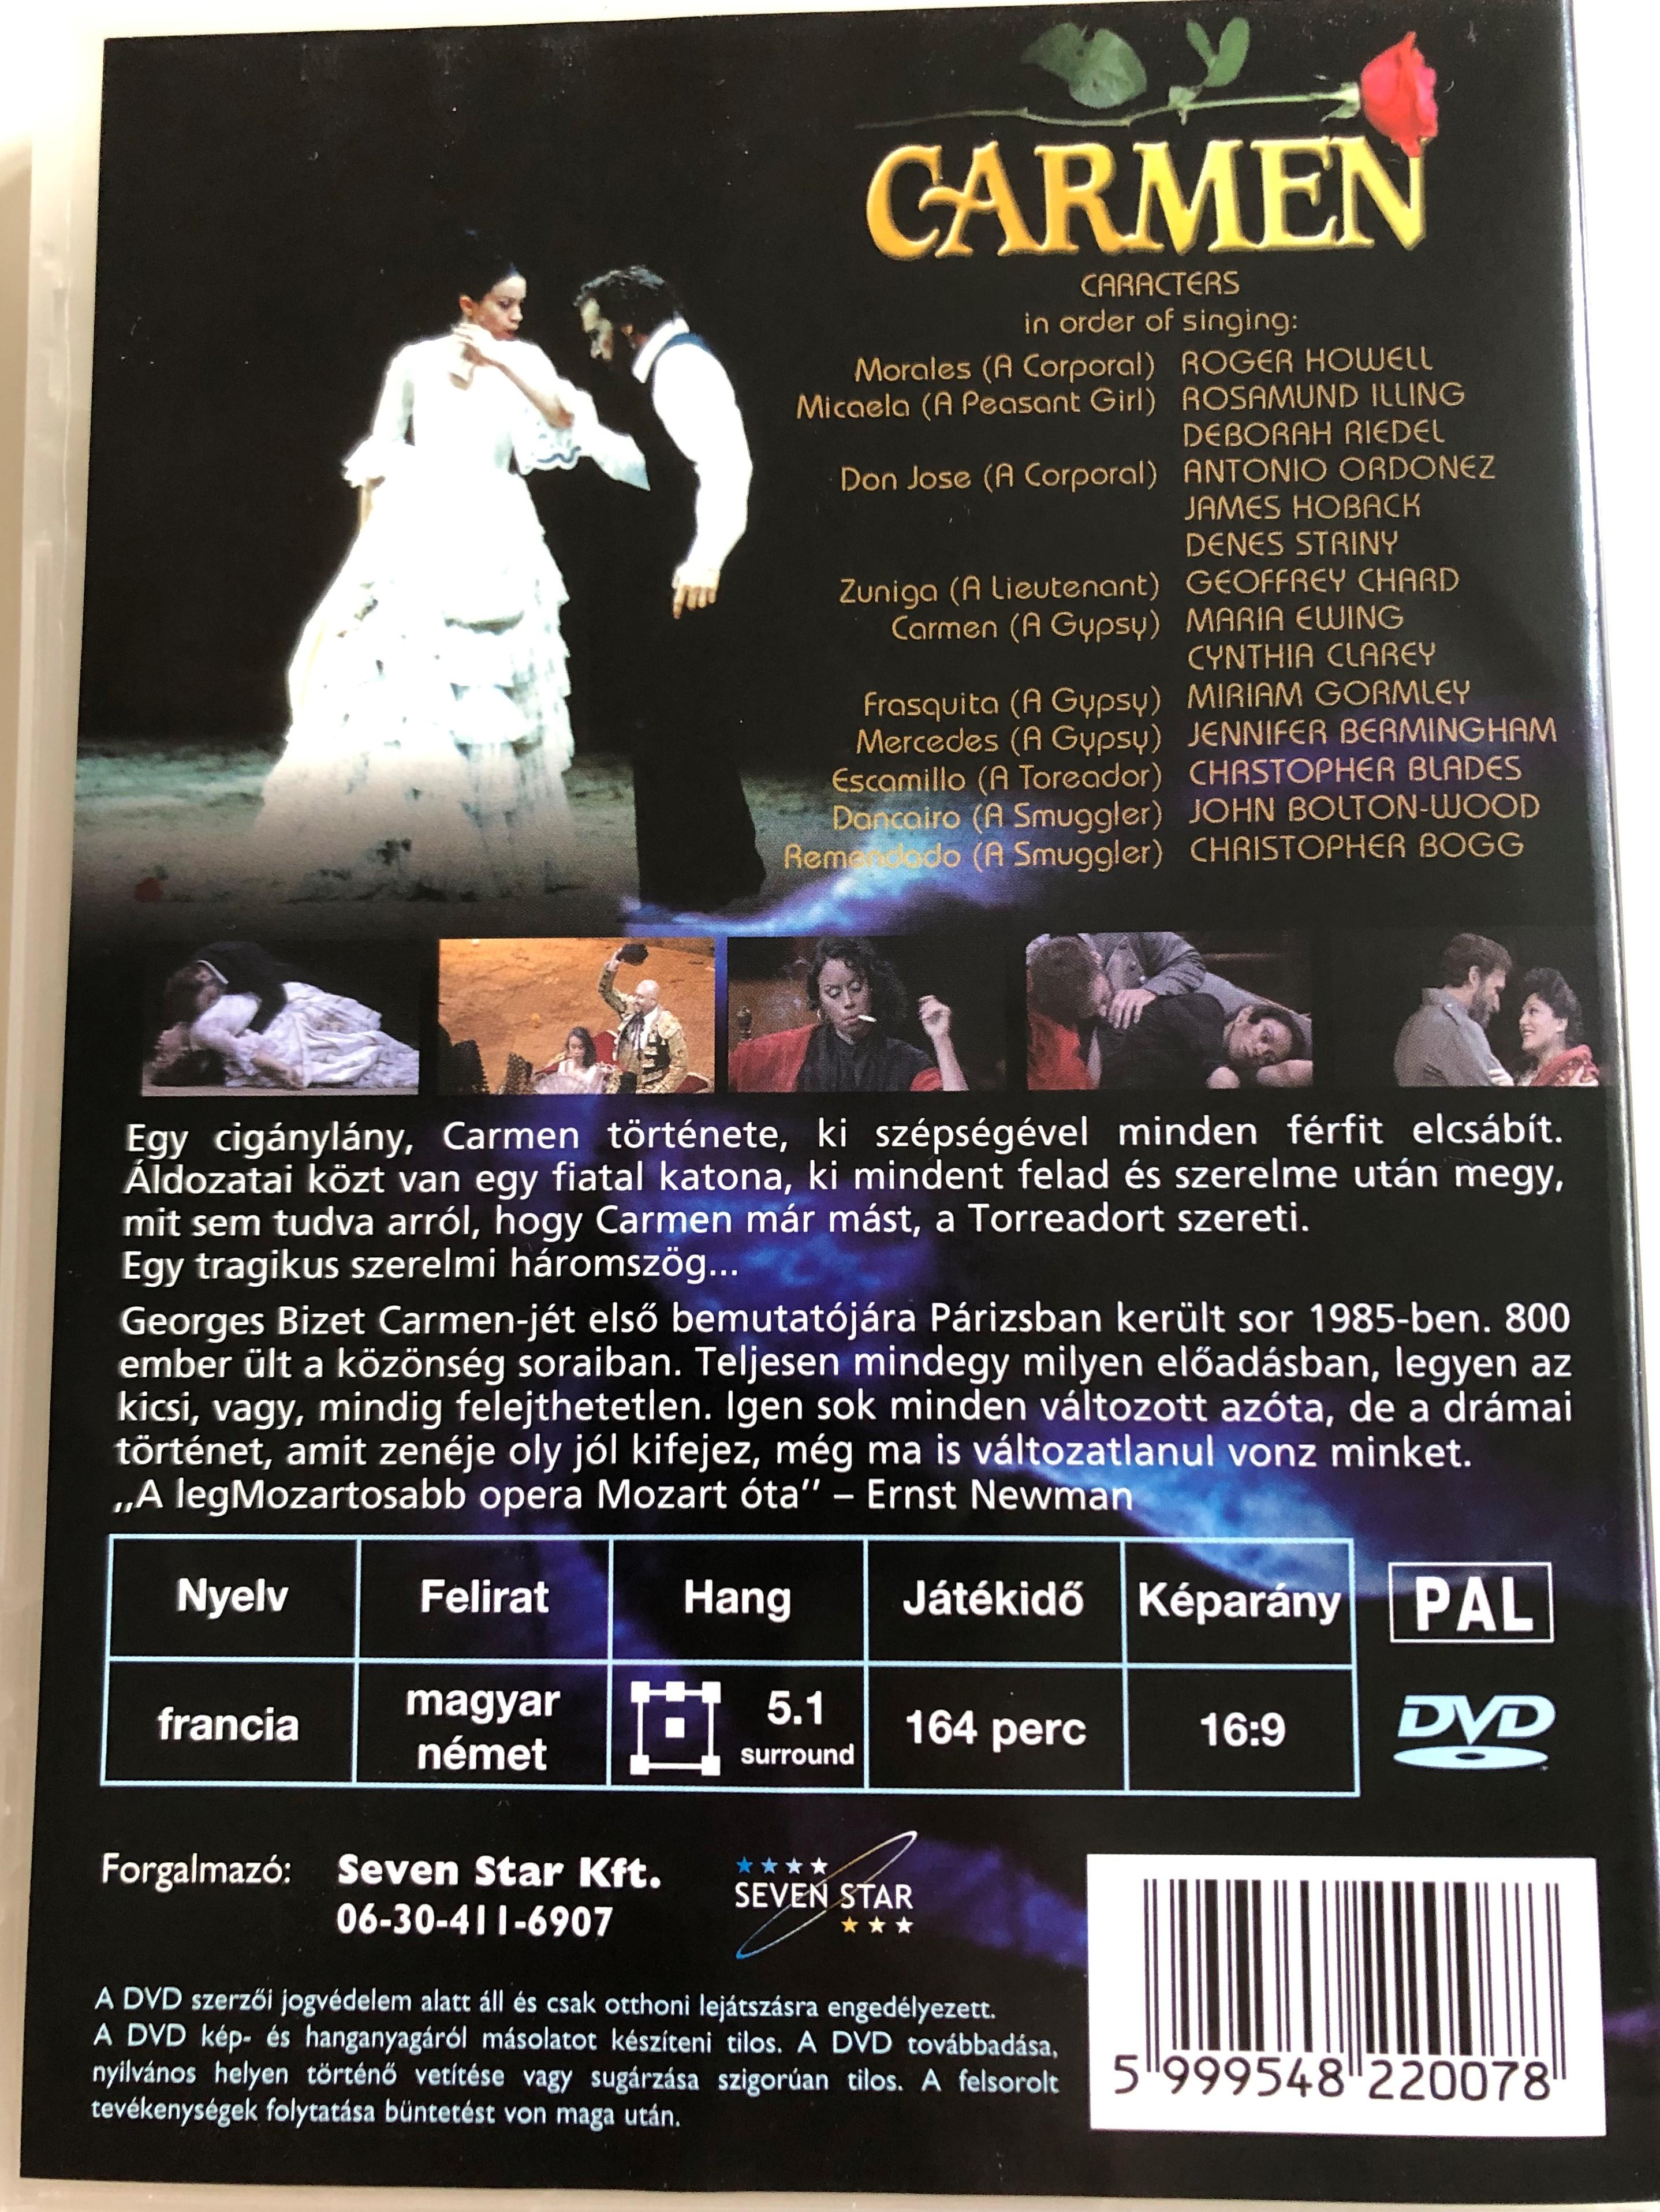 georges-bizet-carmen-dvd-the-australian-philharmonic-orchestra-the-antonio-vargas-flamenco-dance-co.-victoria-state-opera-chorus-2-.jpg